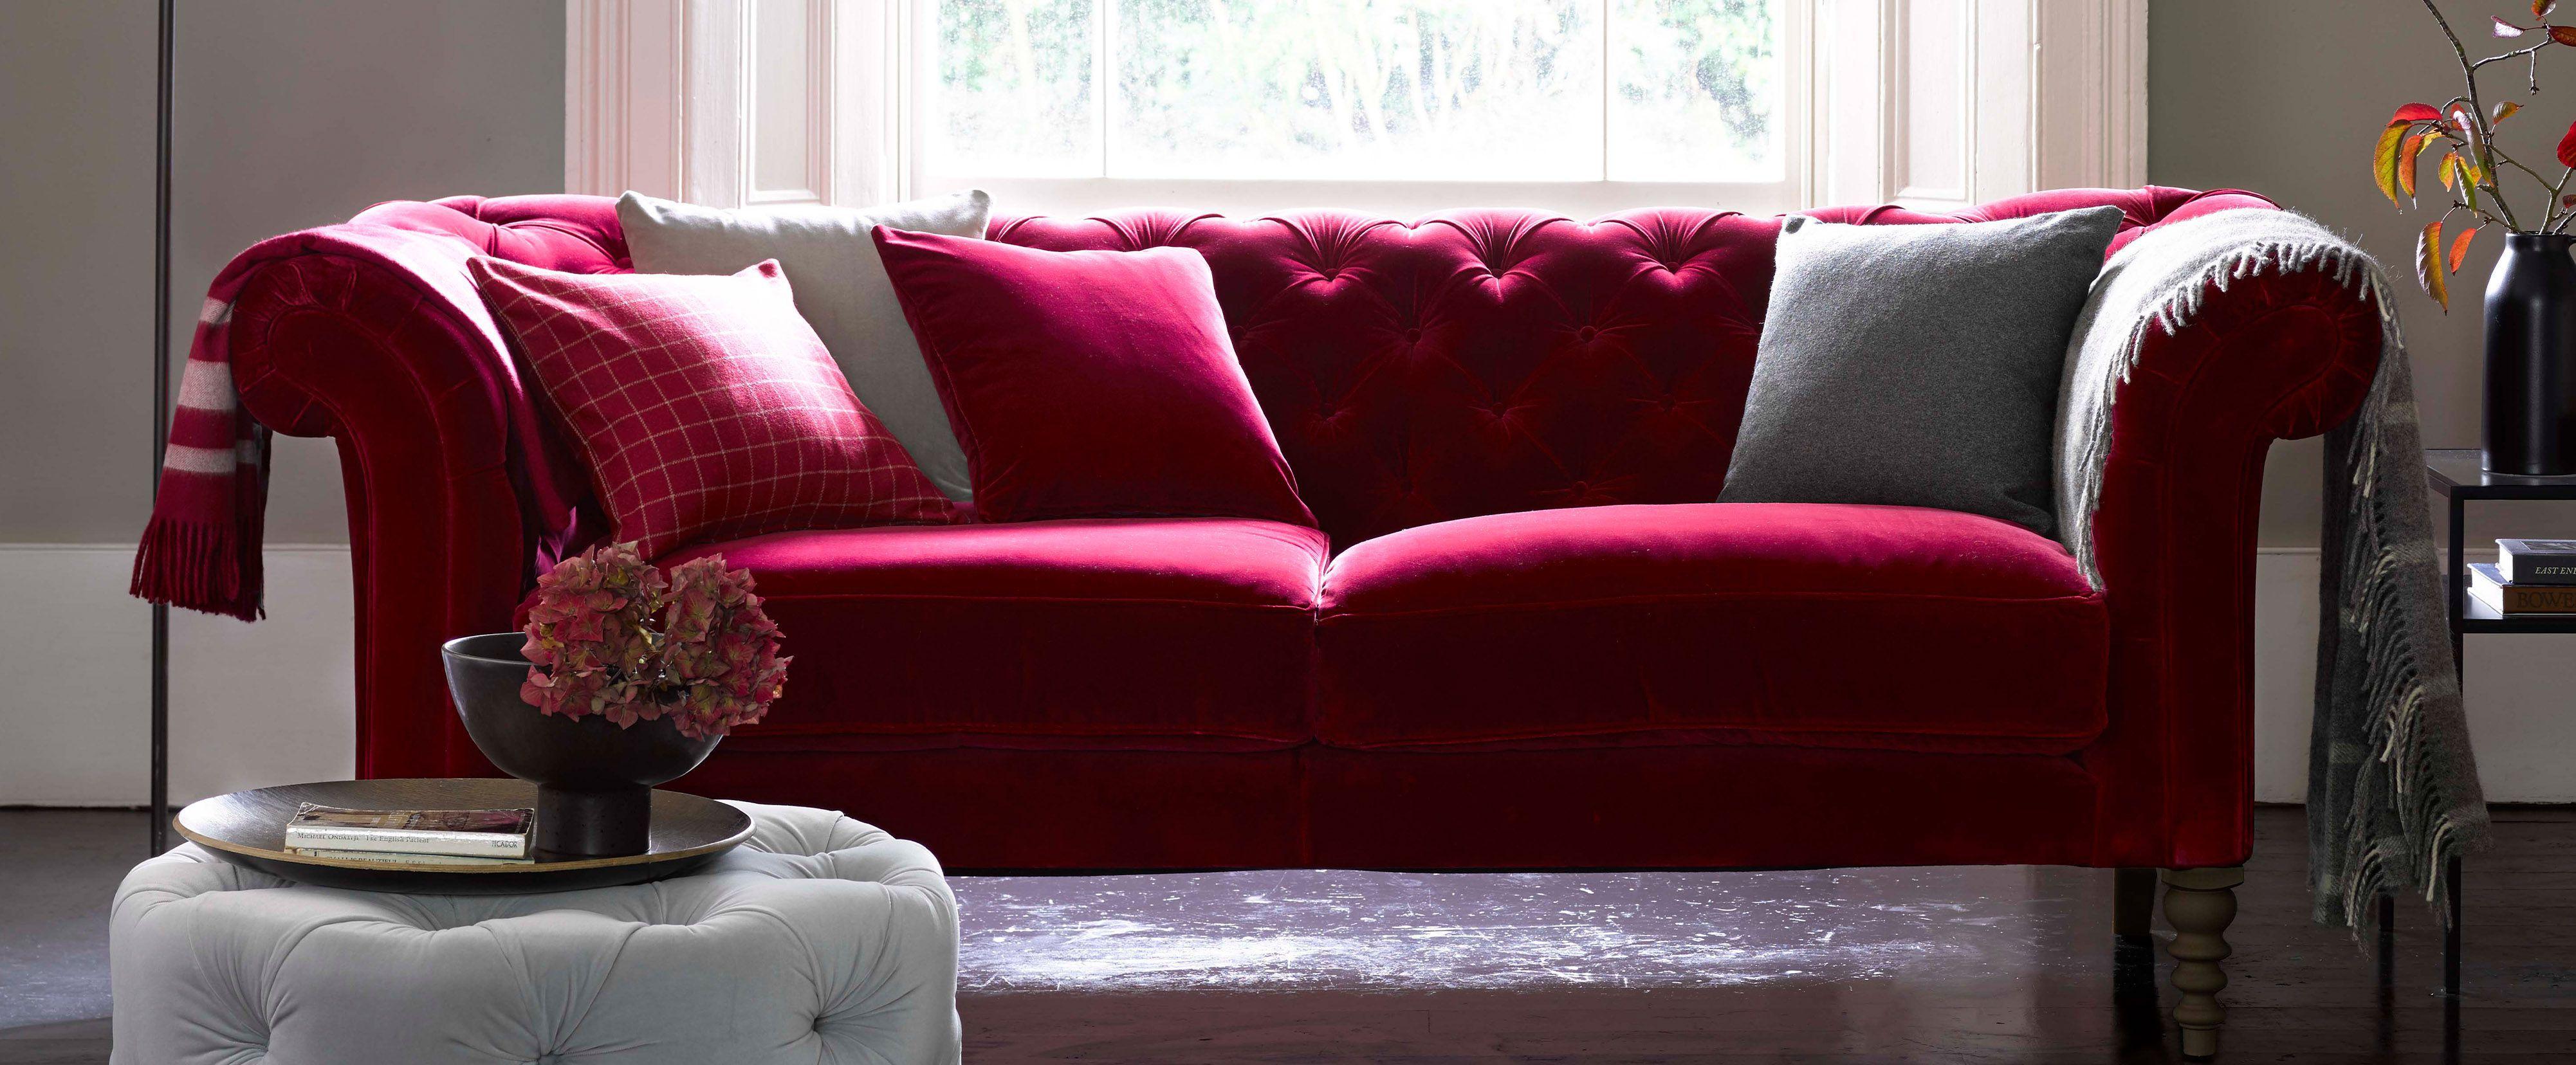 4-seat-sofa.jpg